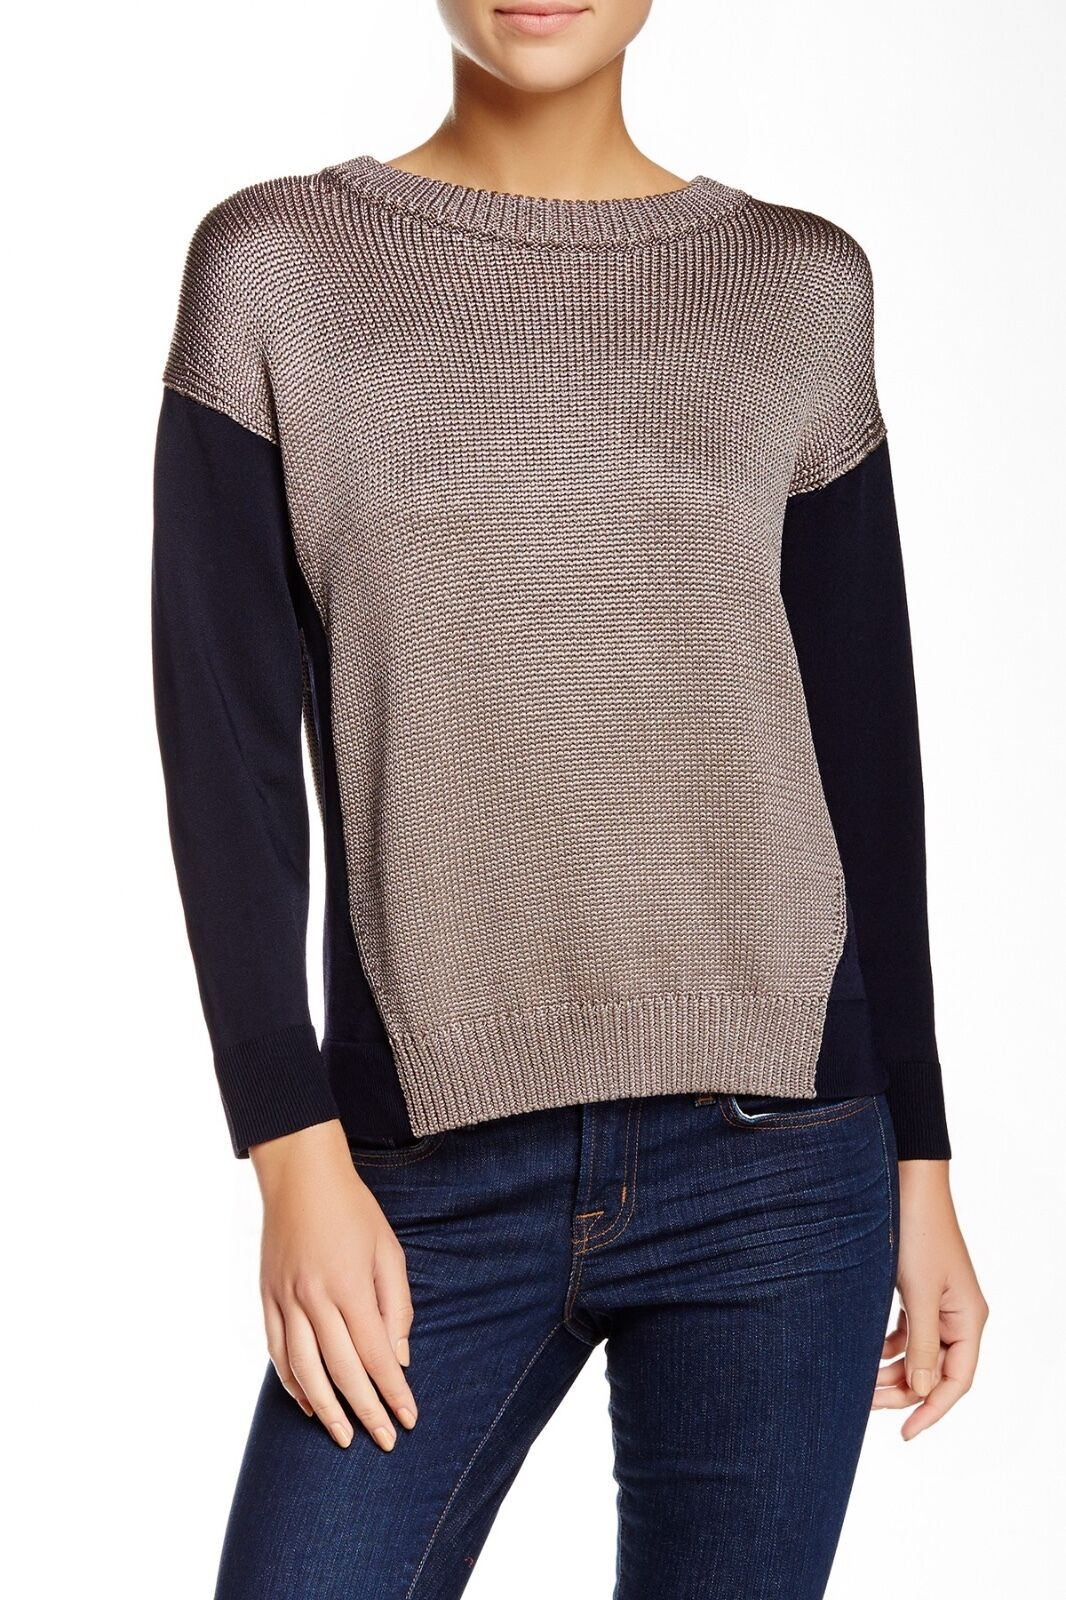 J BRAND Kira Beige Navy bluee Sweater Flowy TITAN  DUKE NEW DEFECT